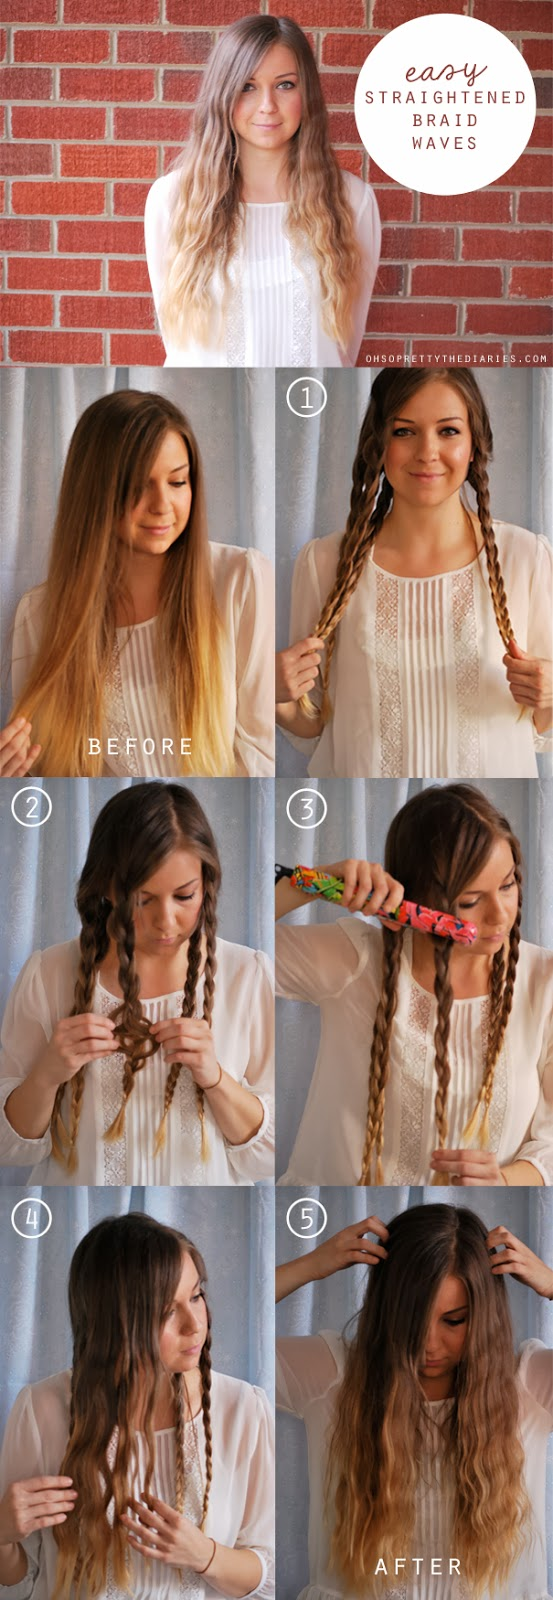 tutorial: straightened braid waves